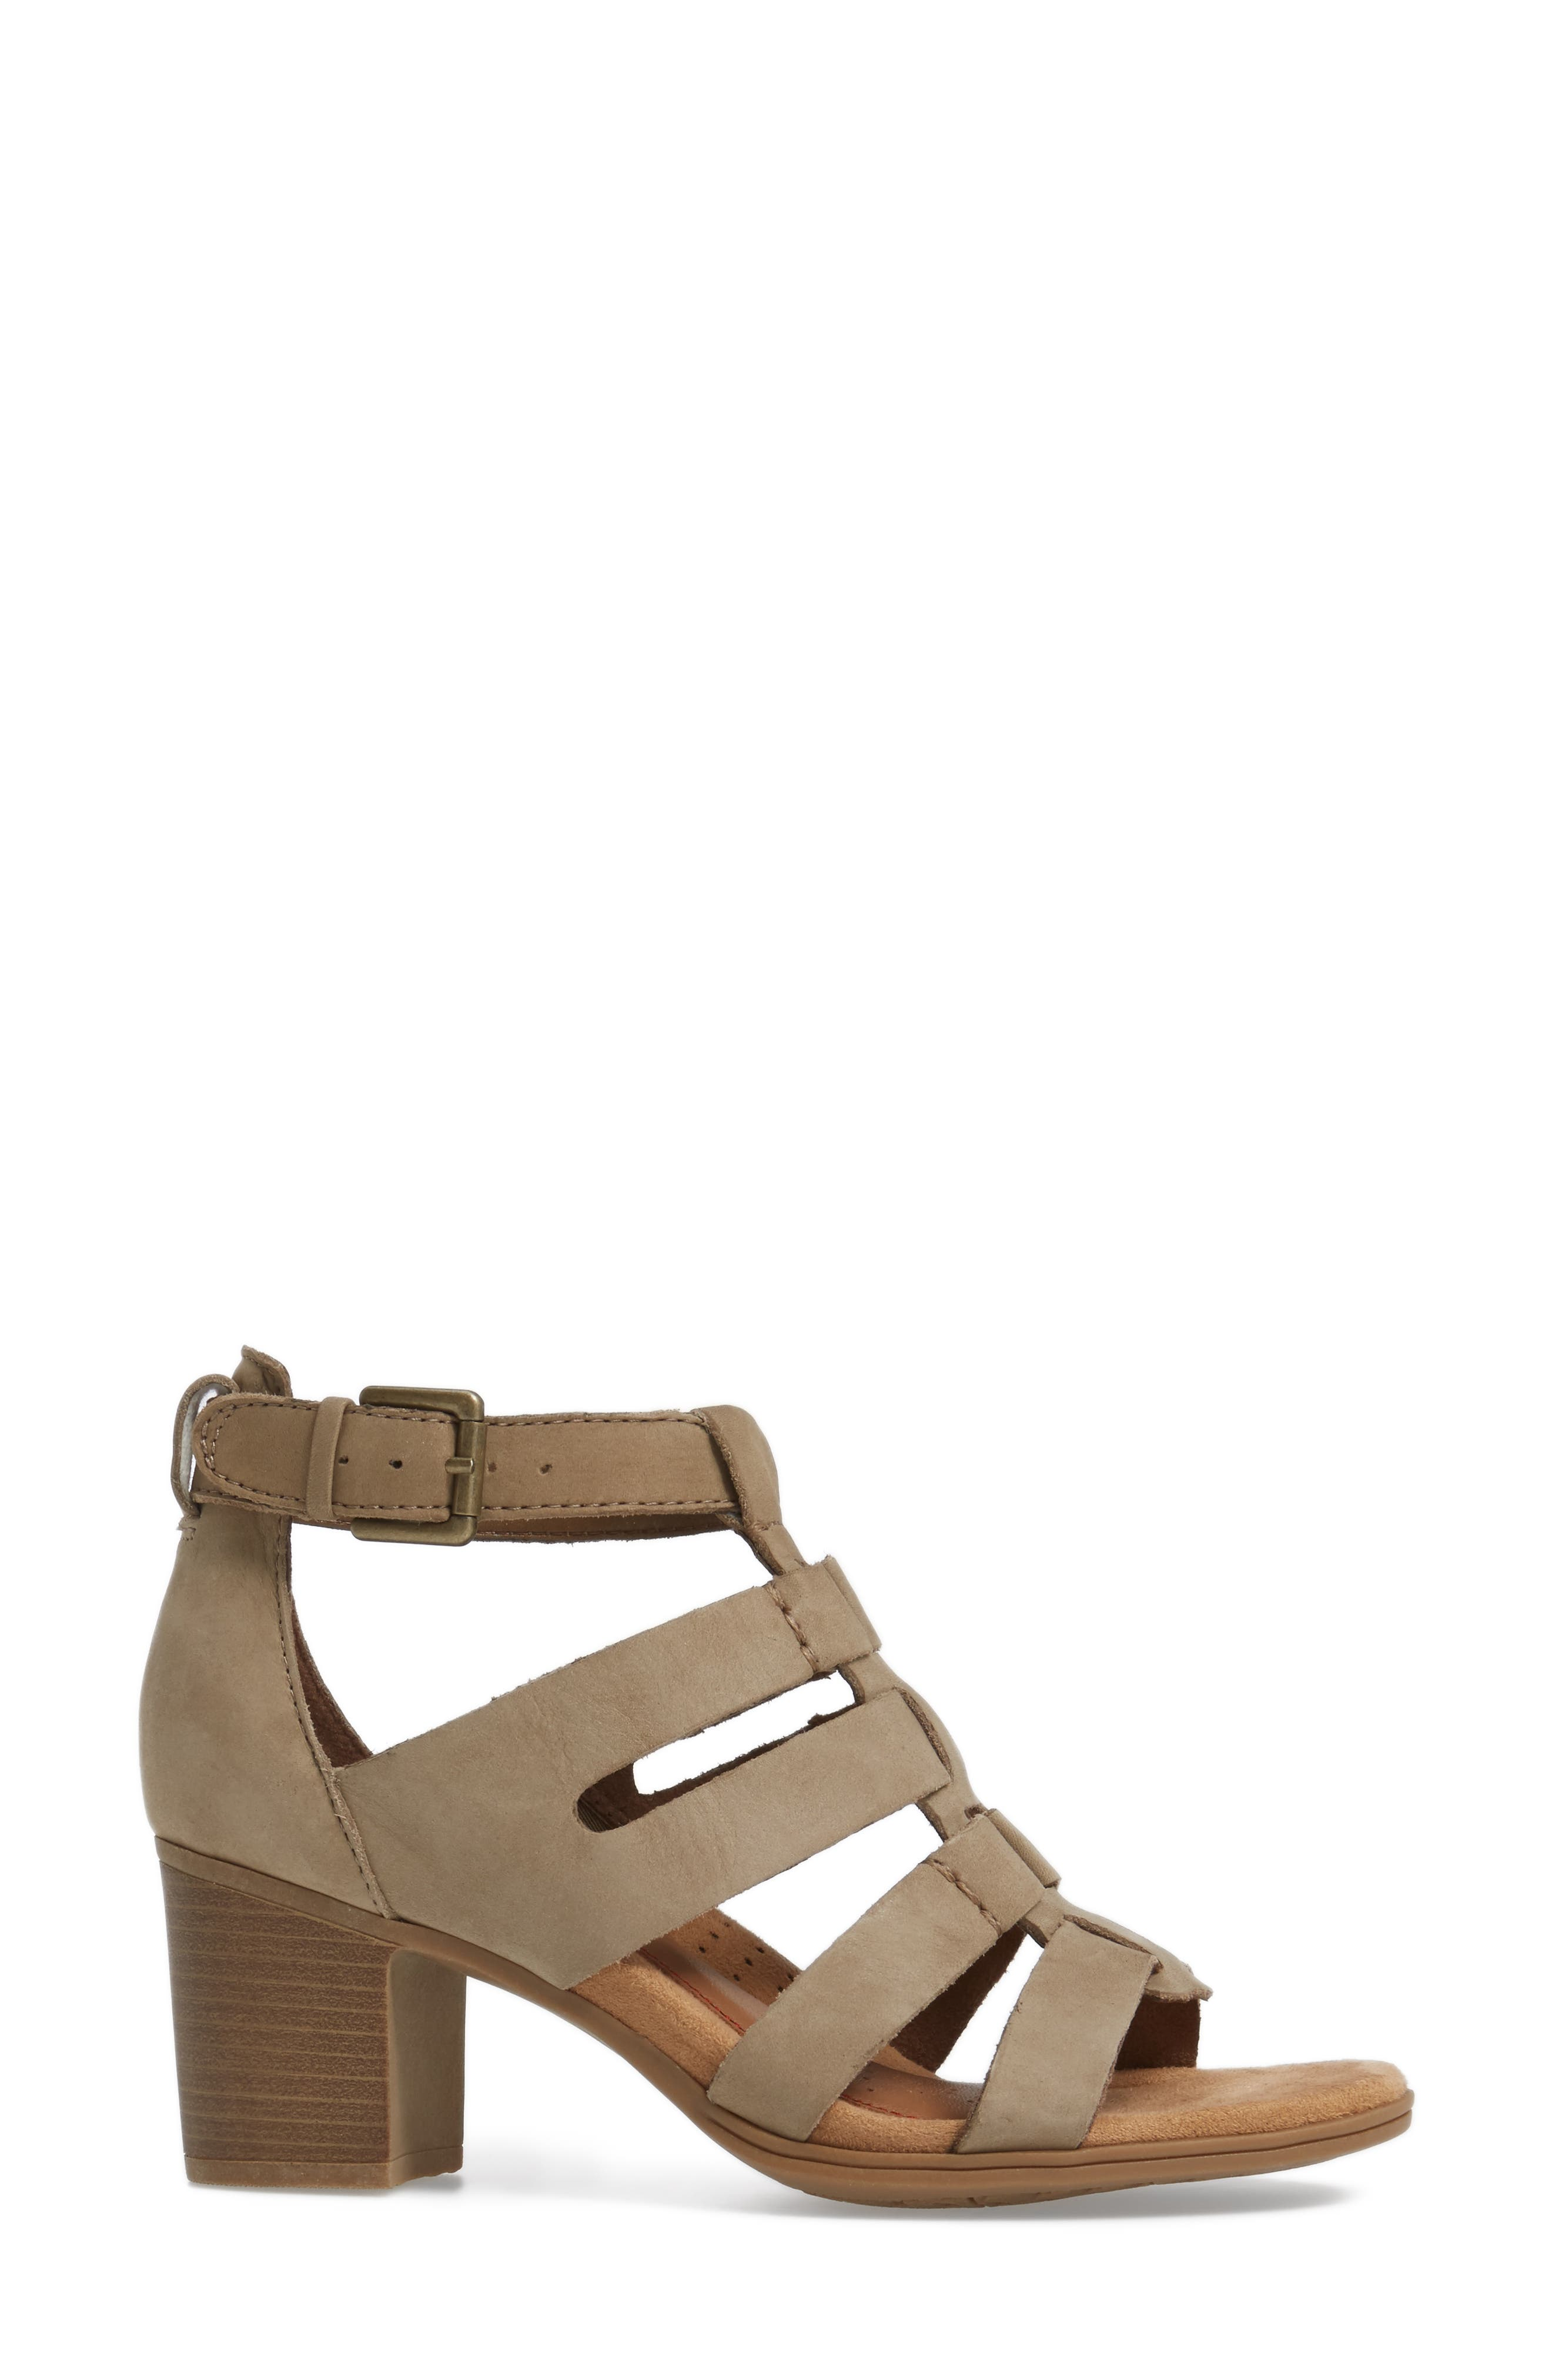 Alternate Image 3  - Rockport Cobb Hill Hattie Block Heel Gladiator Sandal (Women)